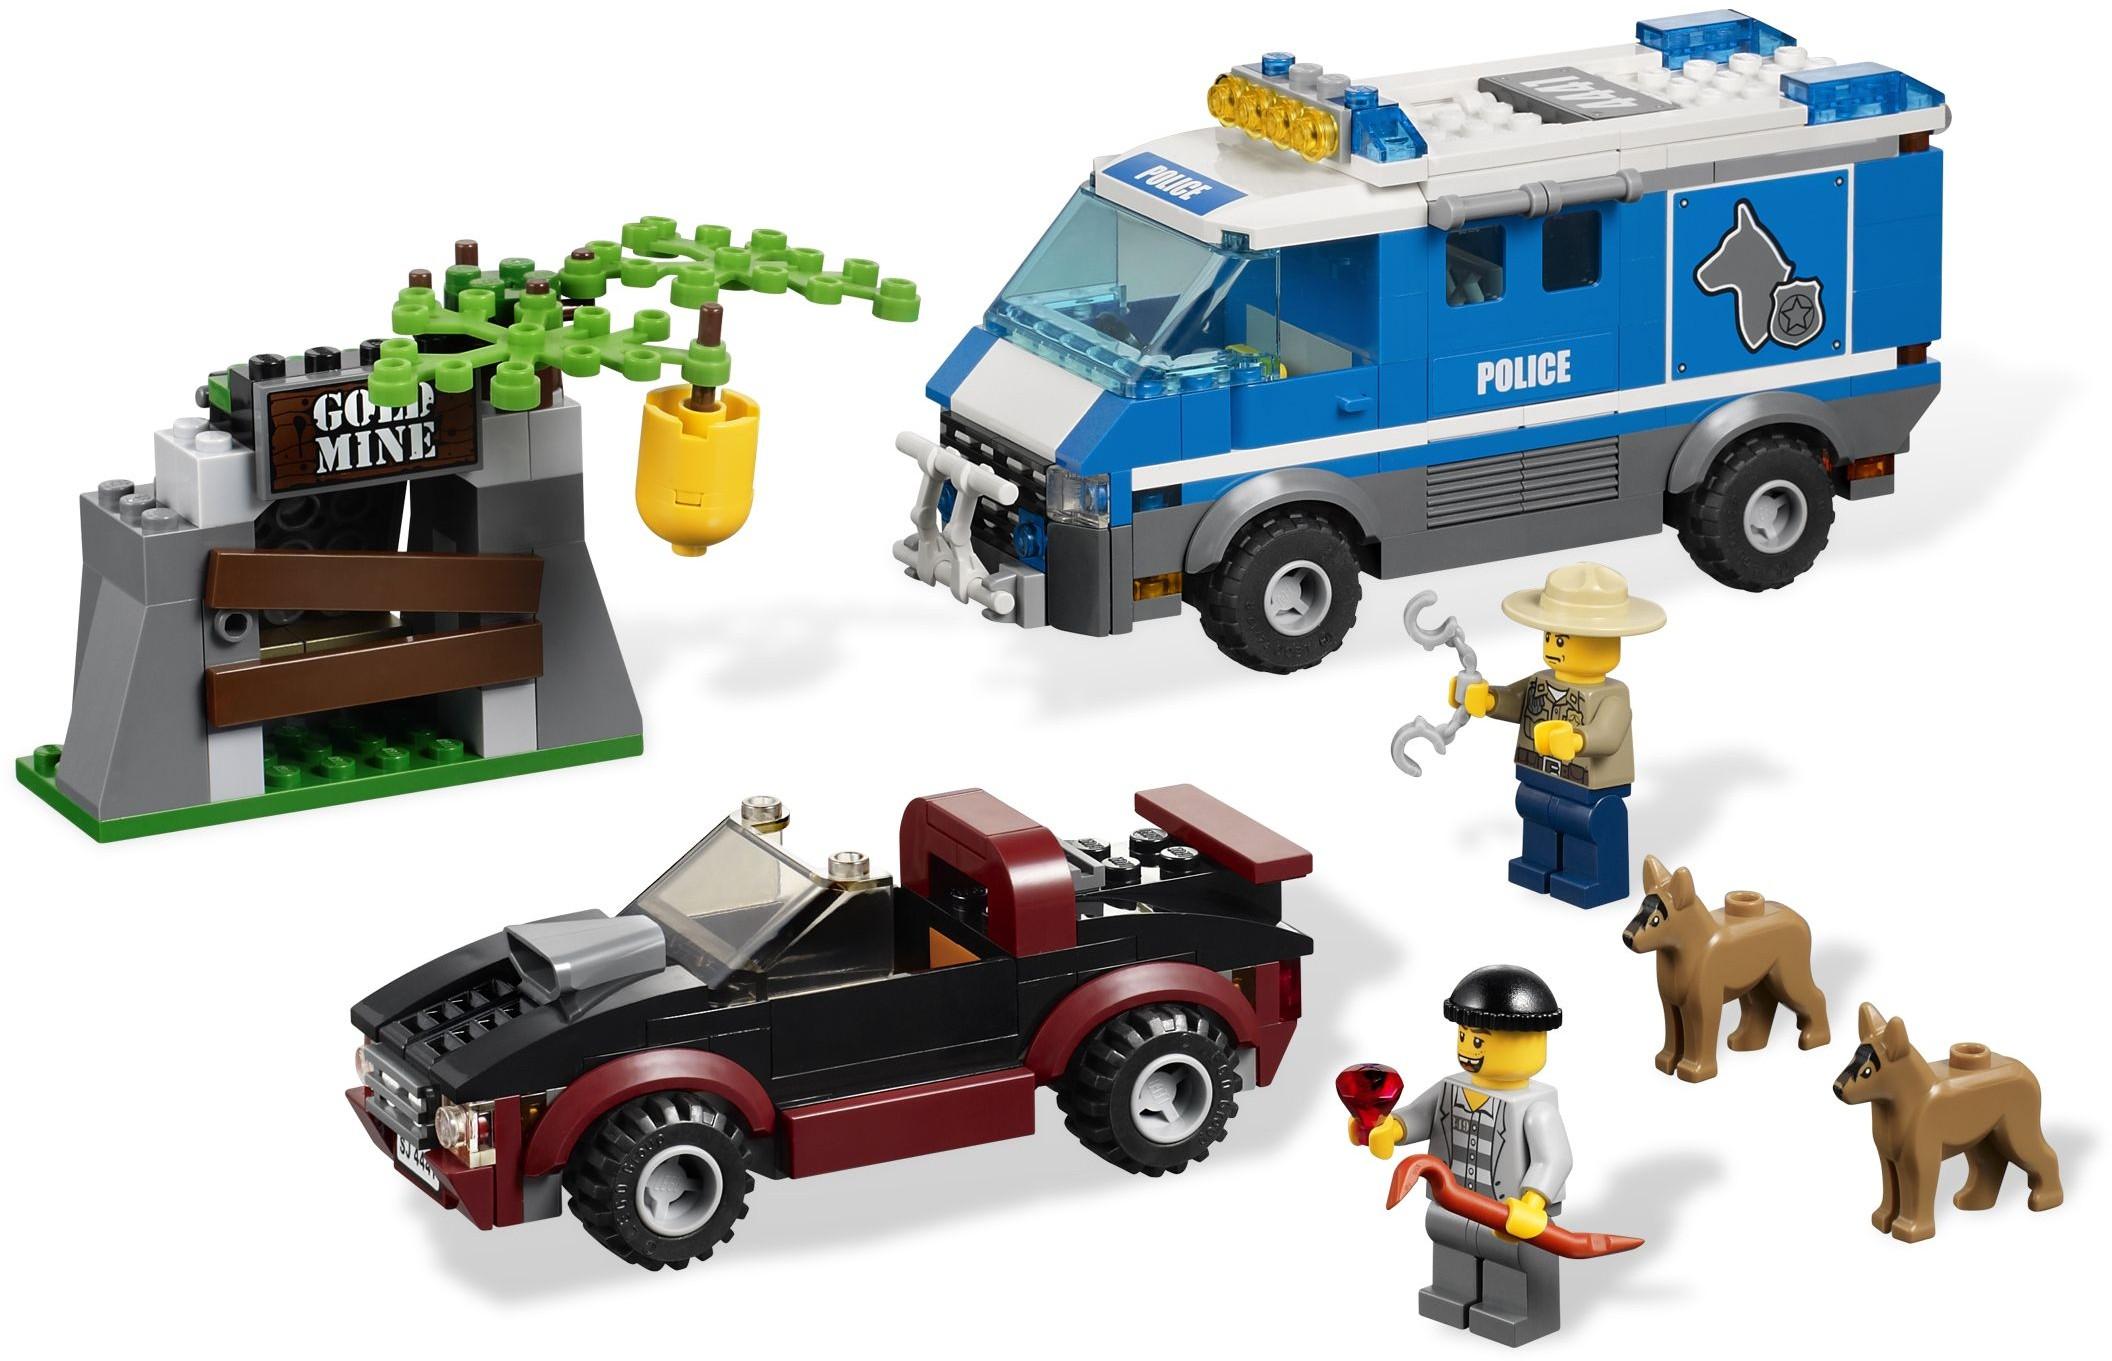 City Forest Police Brickset Lego Set Guide And Database